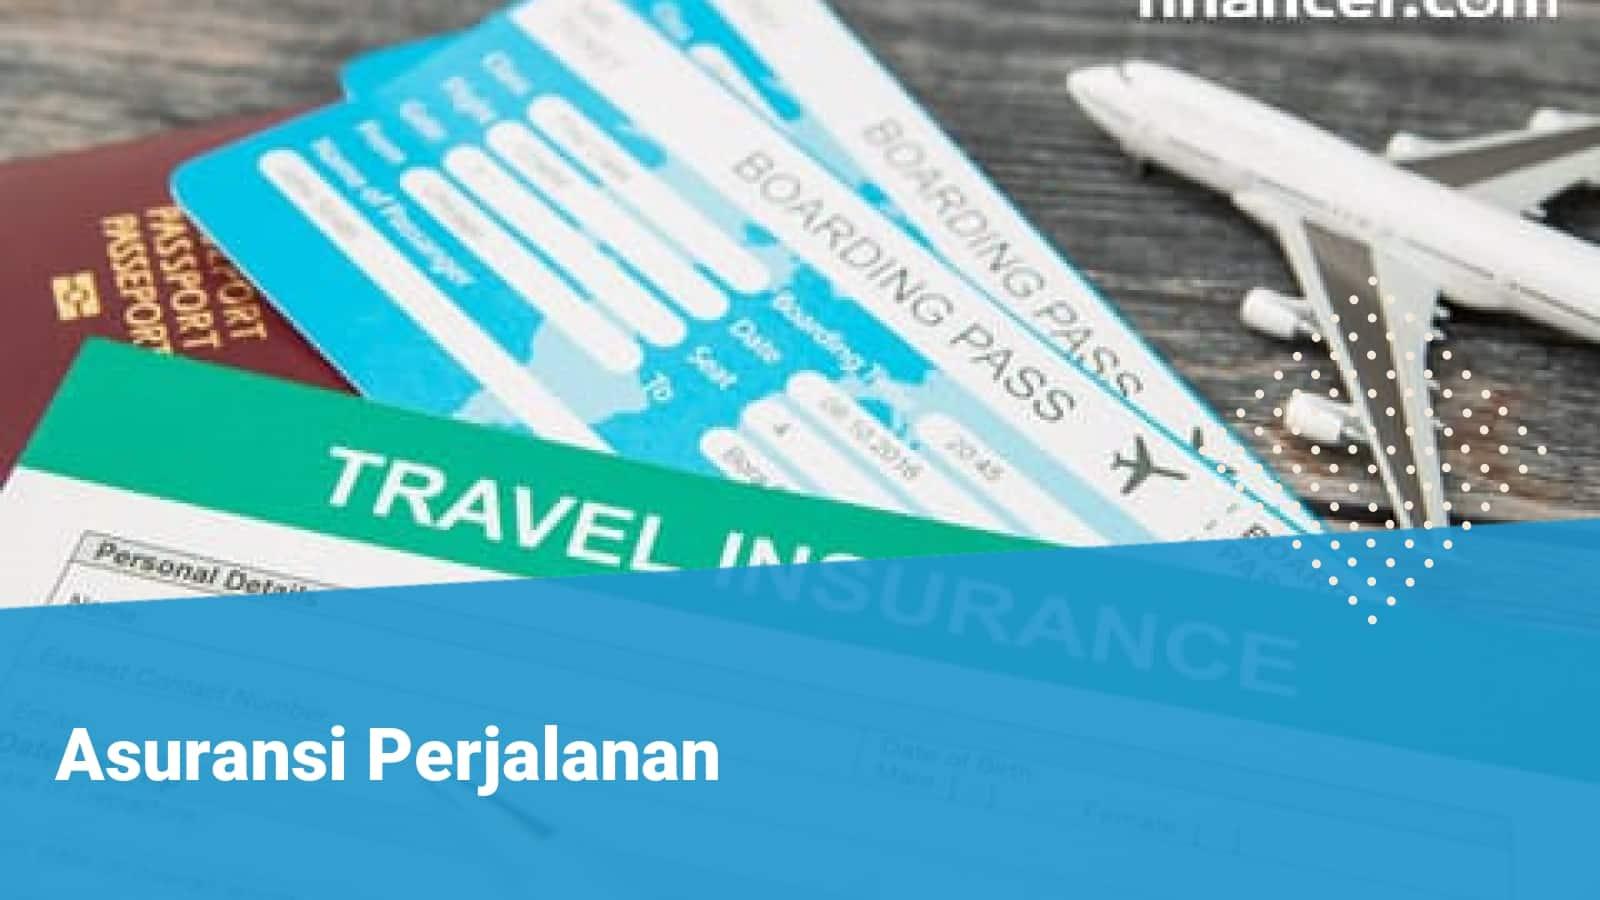 Asuransi Perjalanan - Financer.com